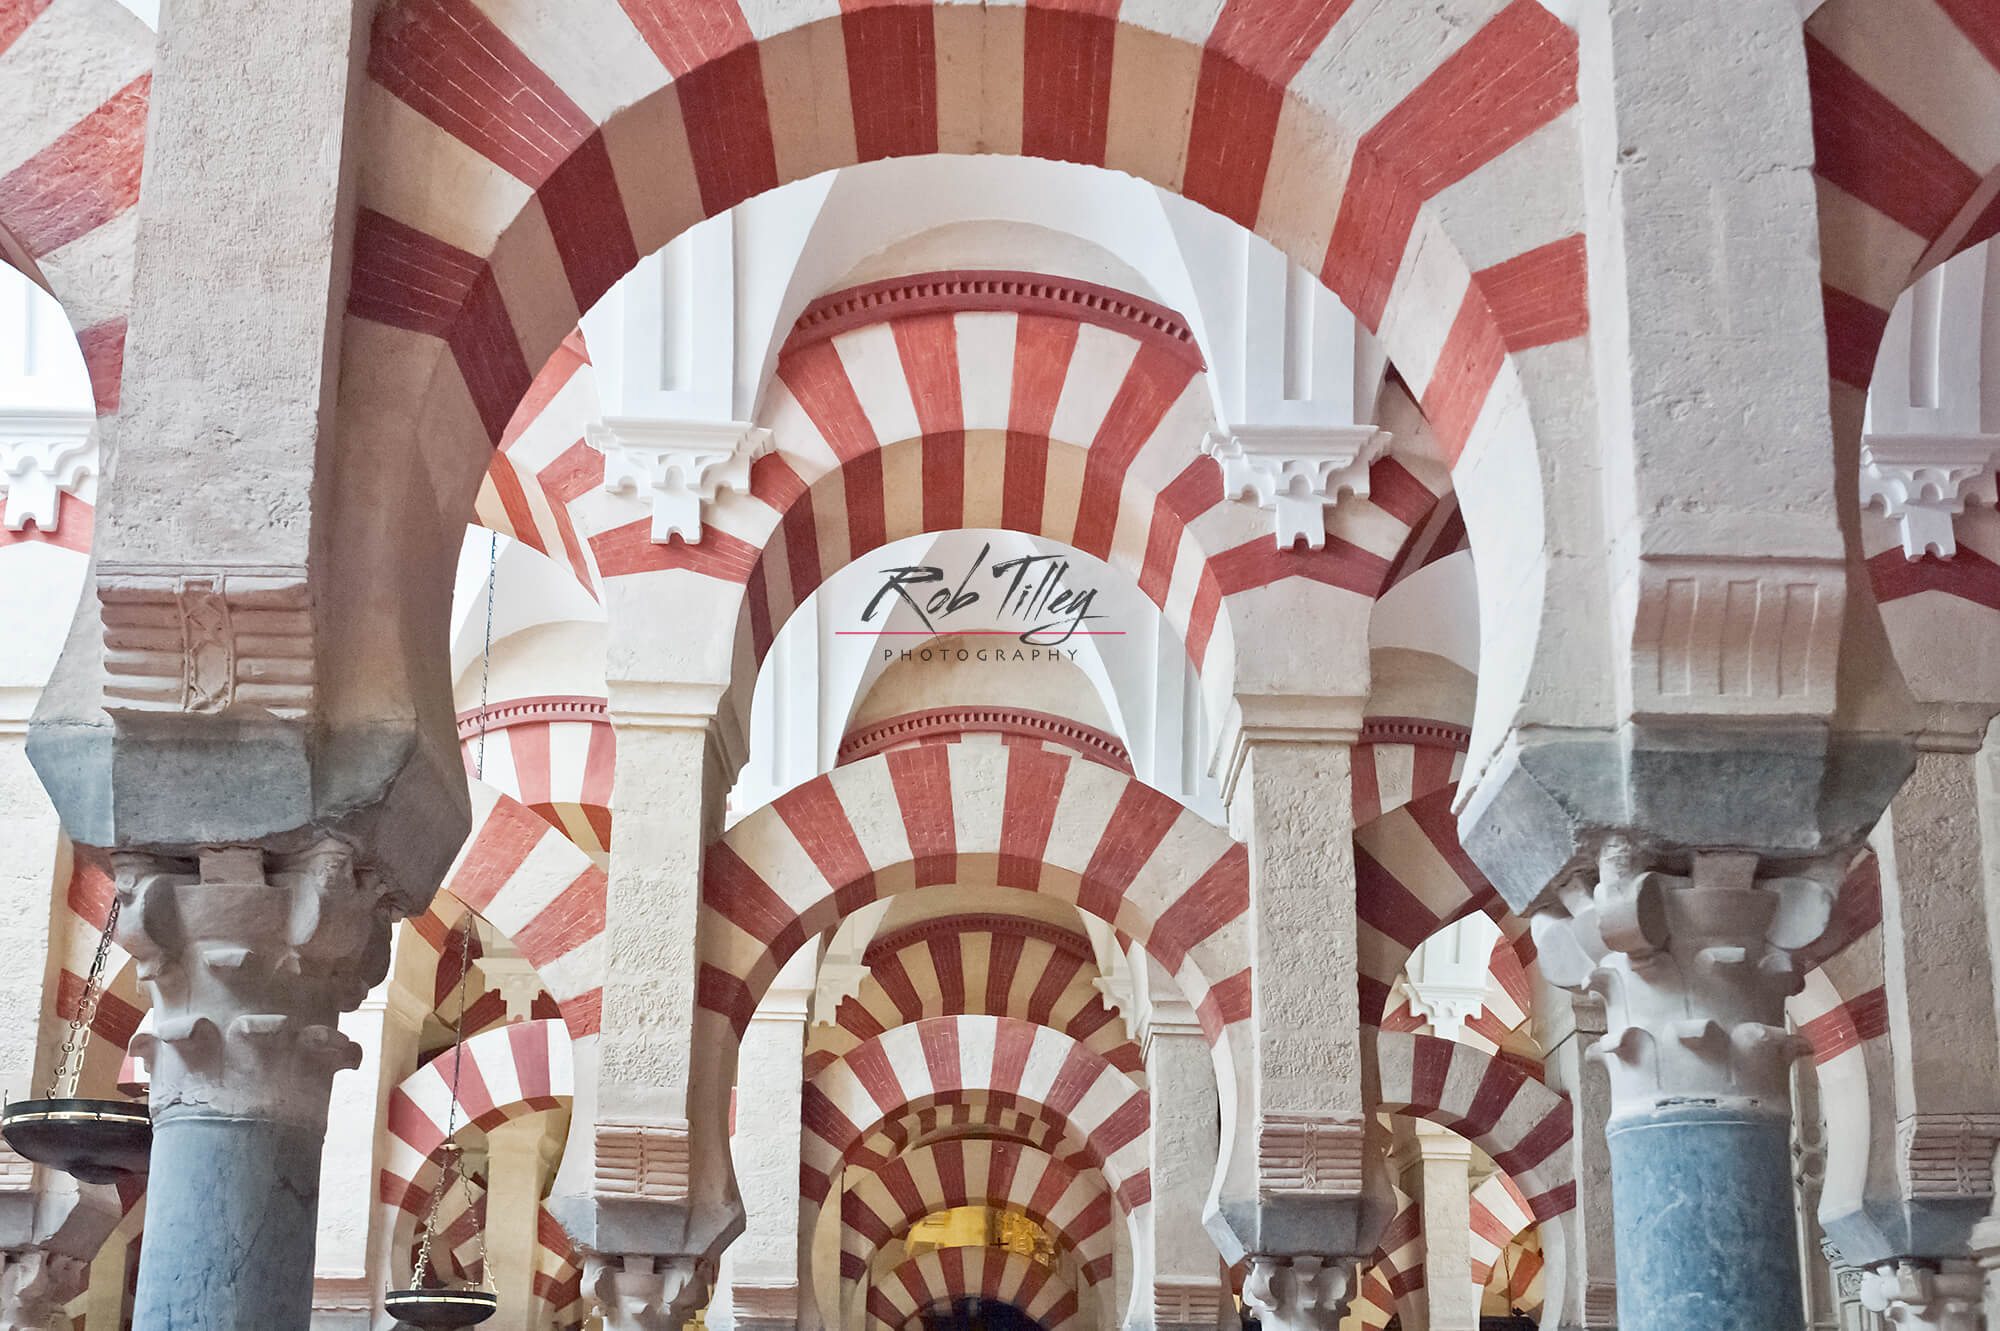 La Mezquita I